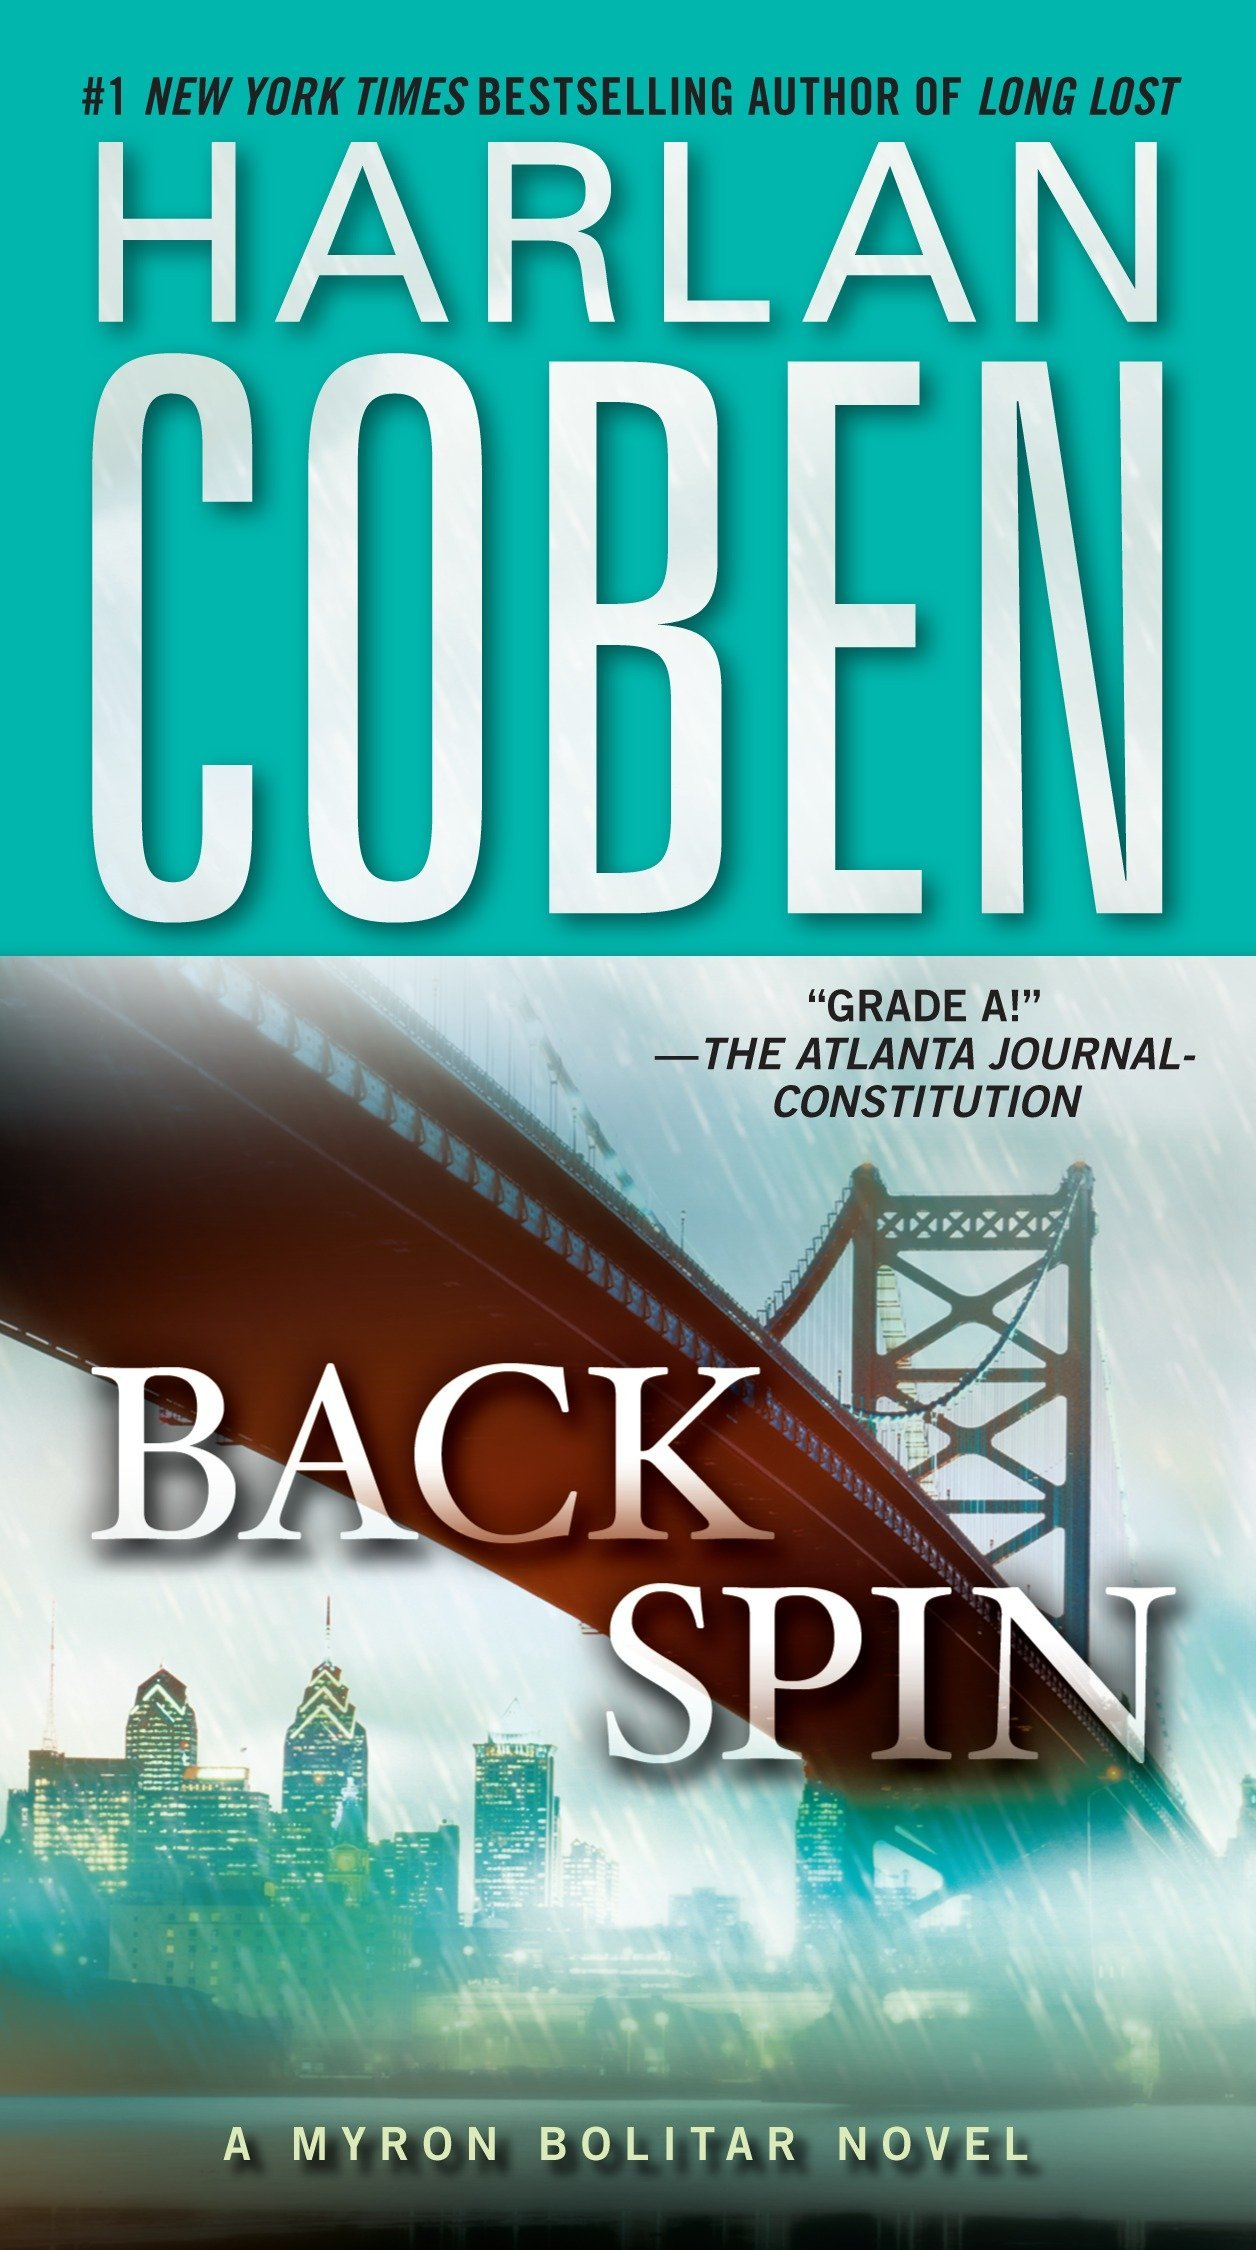 Amazon Fr Back Spin A Myron Bolitar Novel Harlan Coben